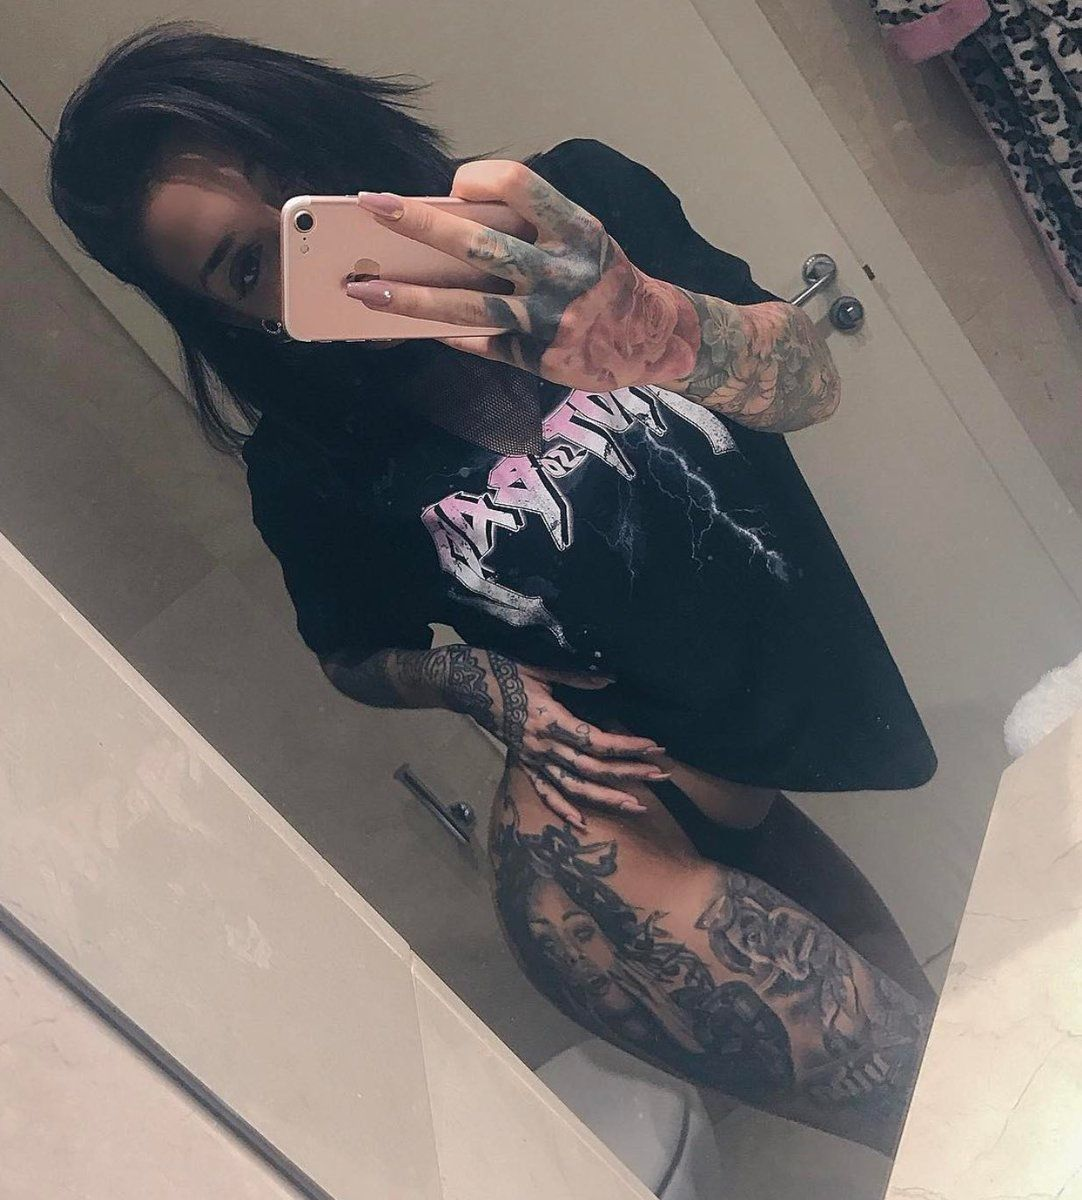 Paula Gonzalez Paula Gh15 Twitter Tatuajes Pierna Instagram Piernas